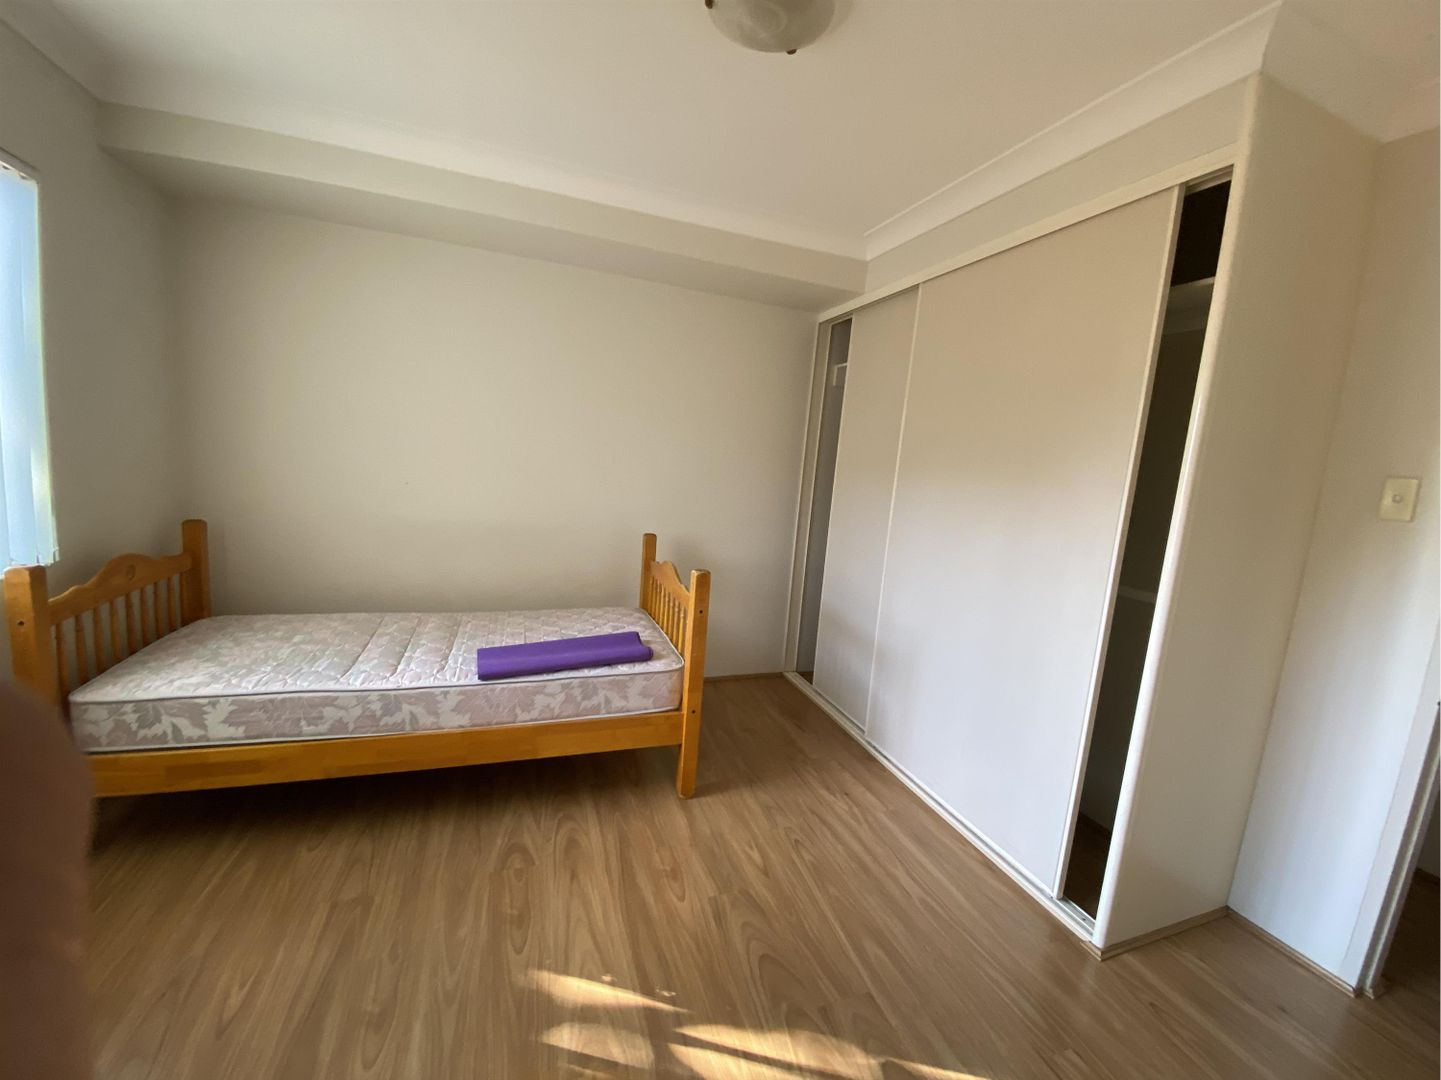 Riverwood NSW 2210, Image 1